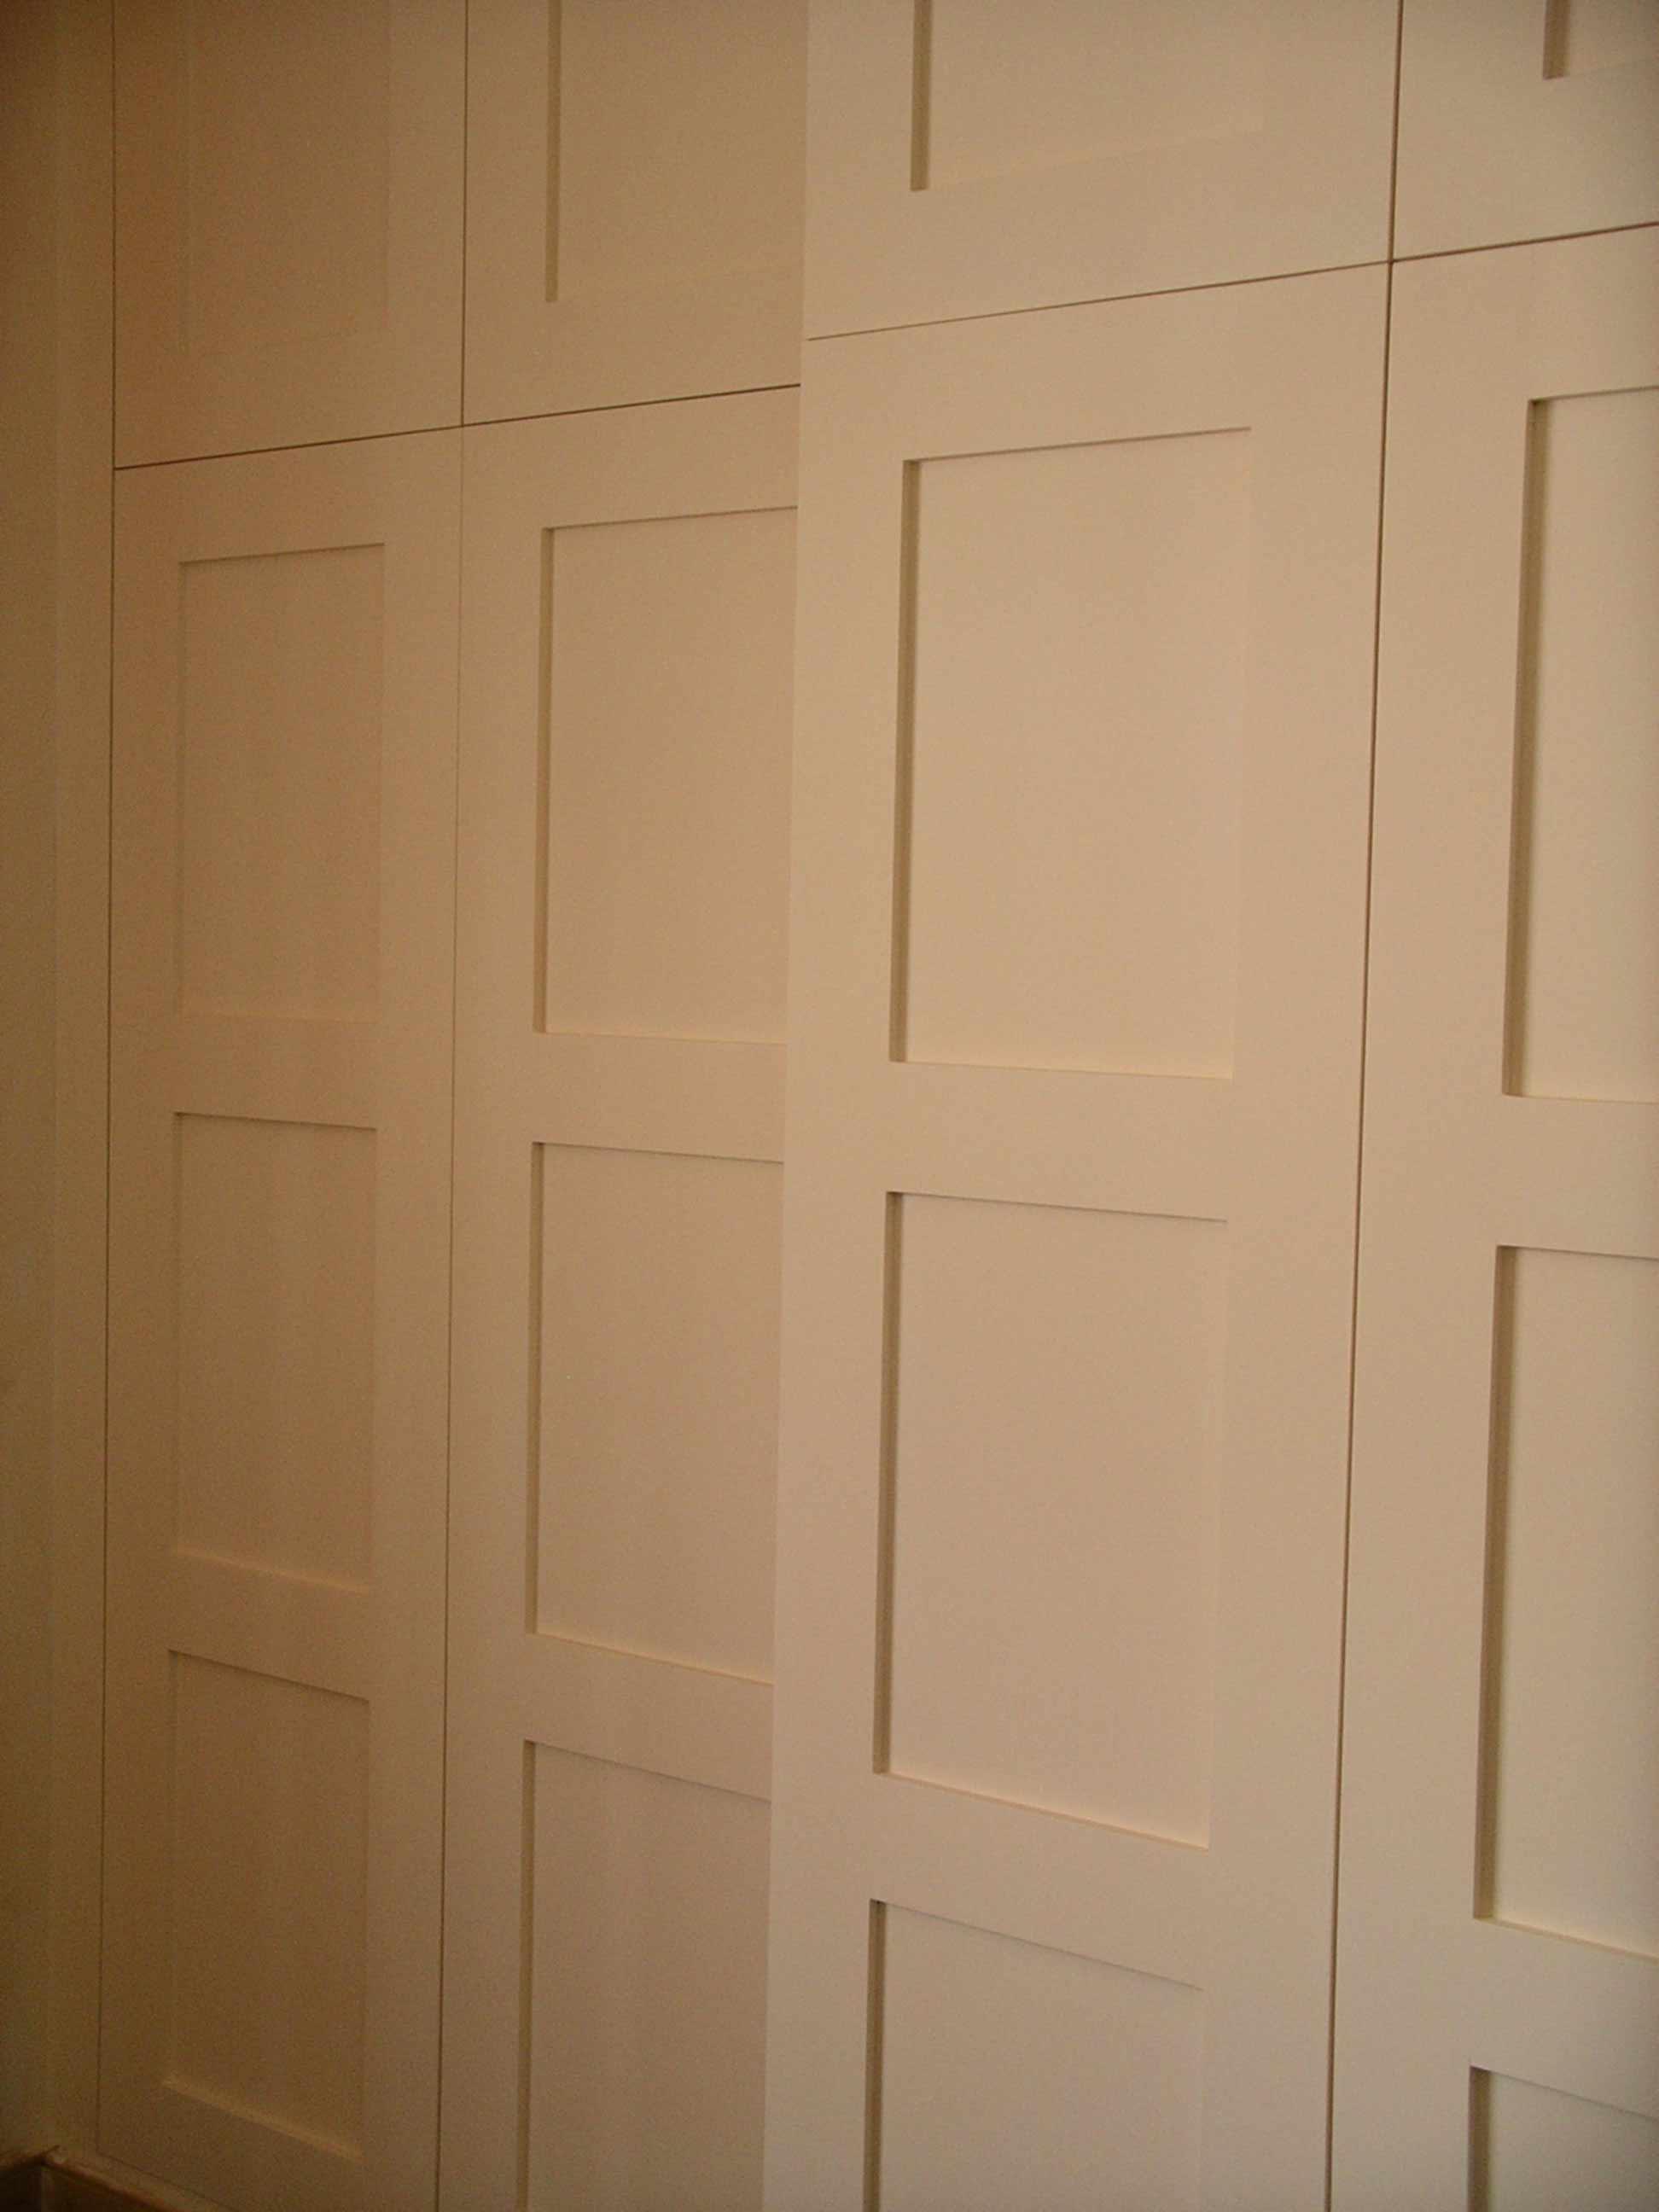 Paneled Door Wardrobe Bespoke Made By Peter Henderson